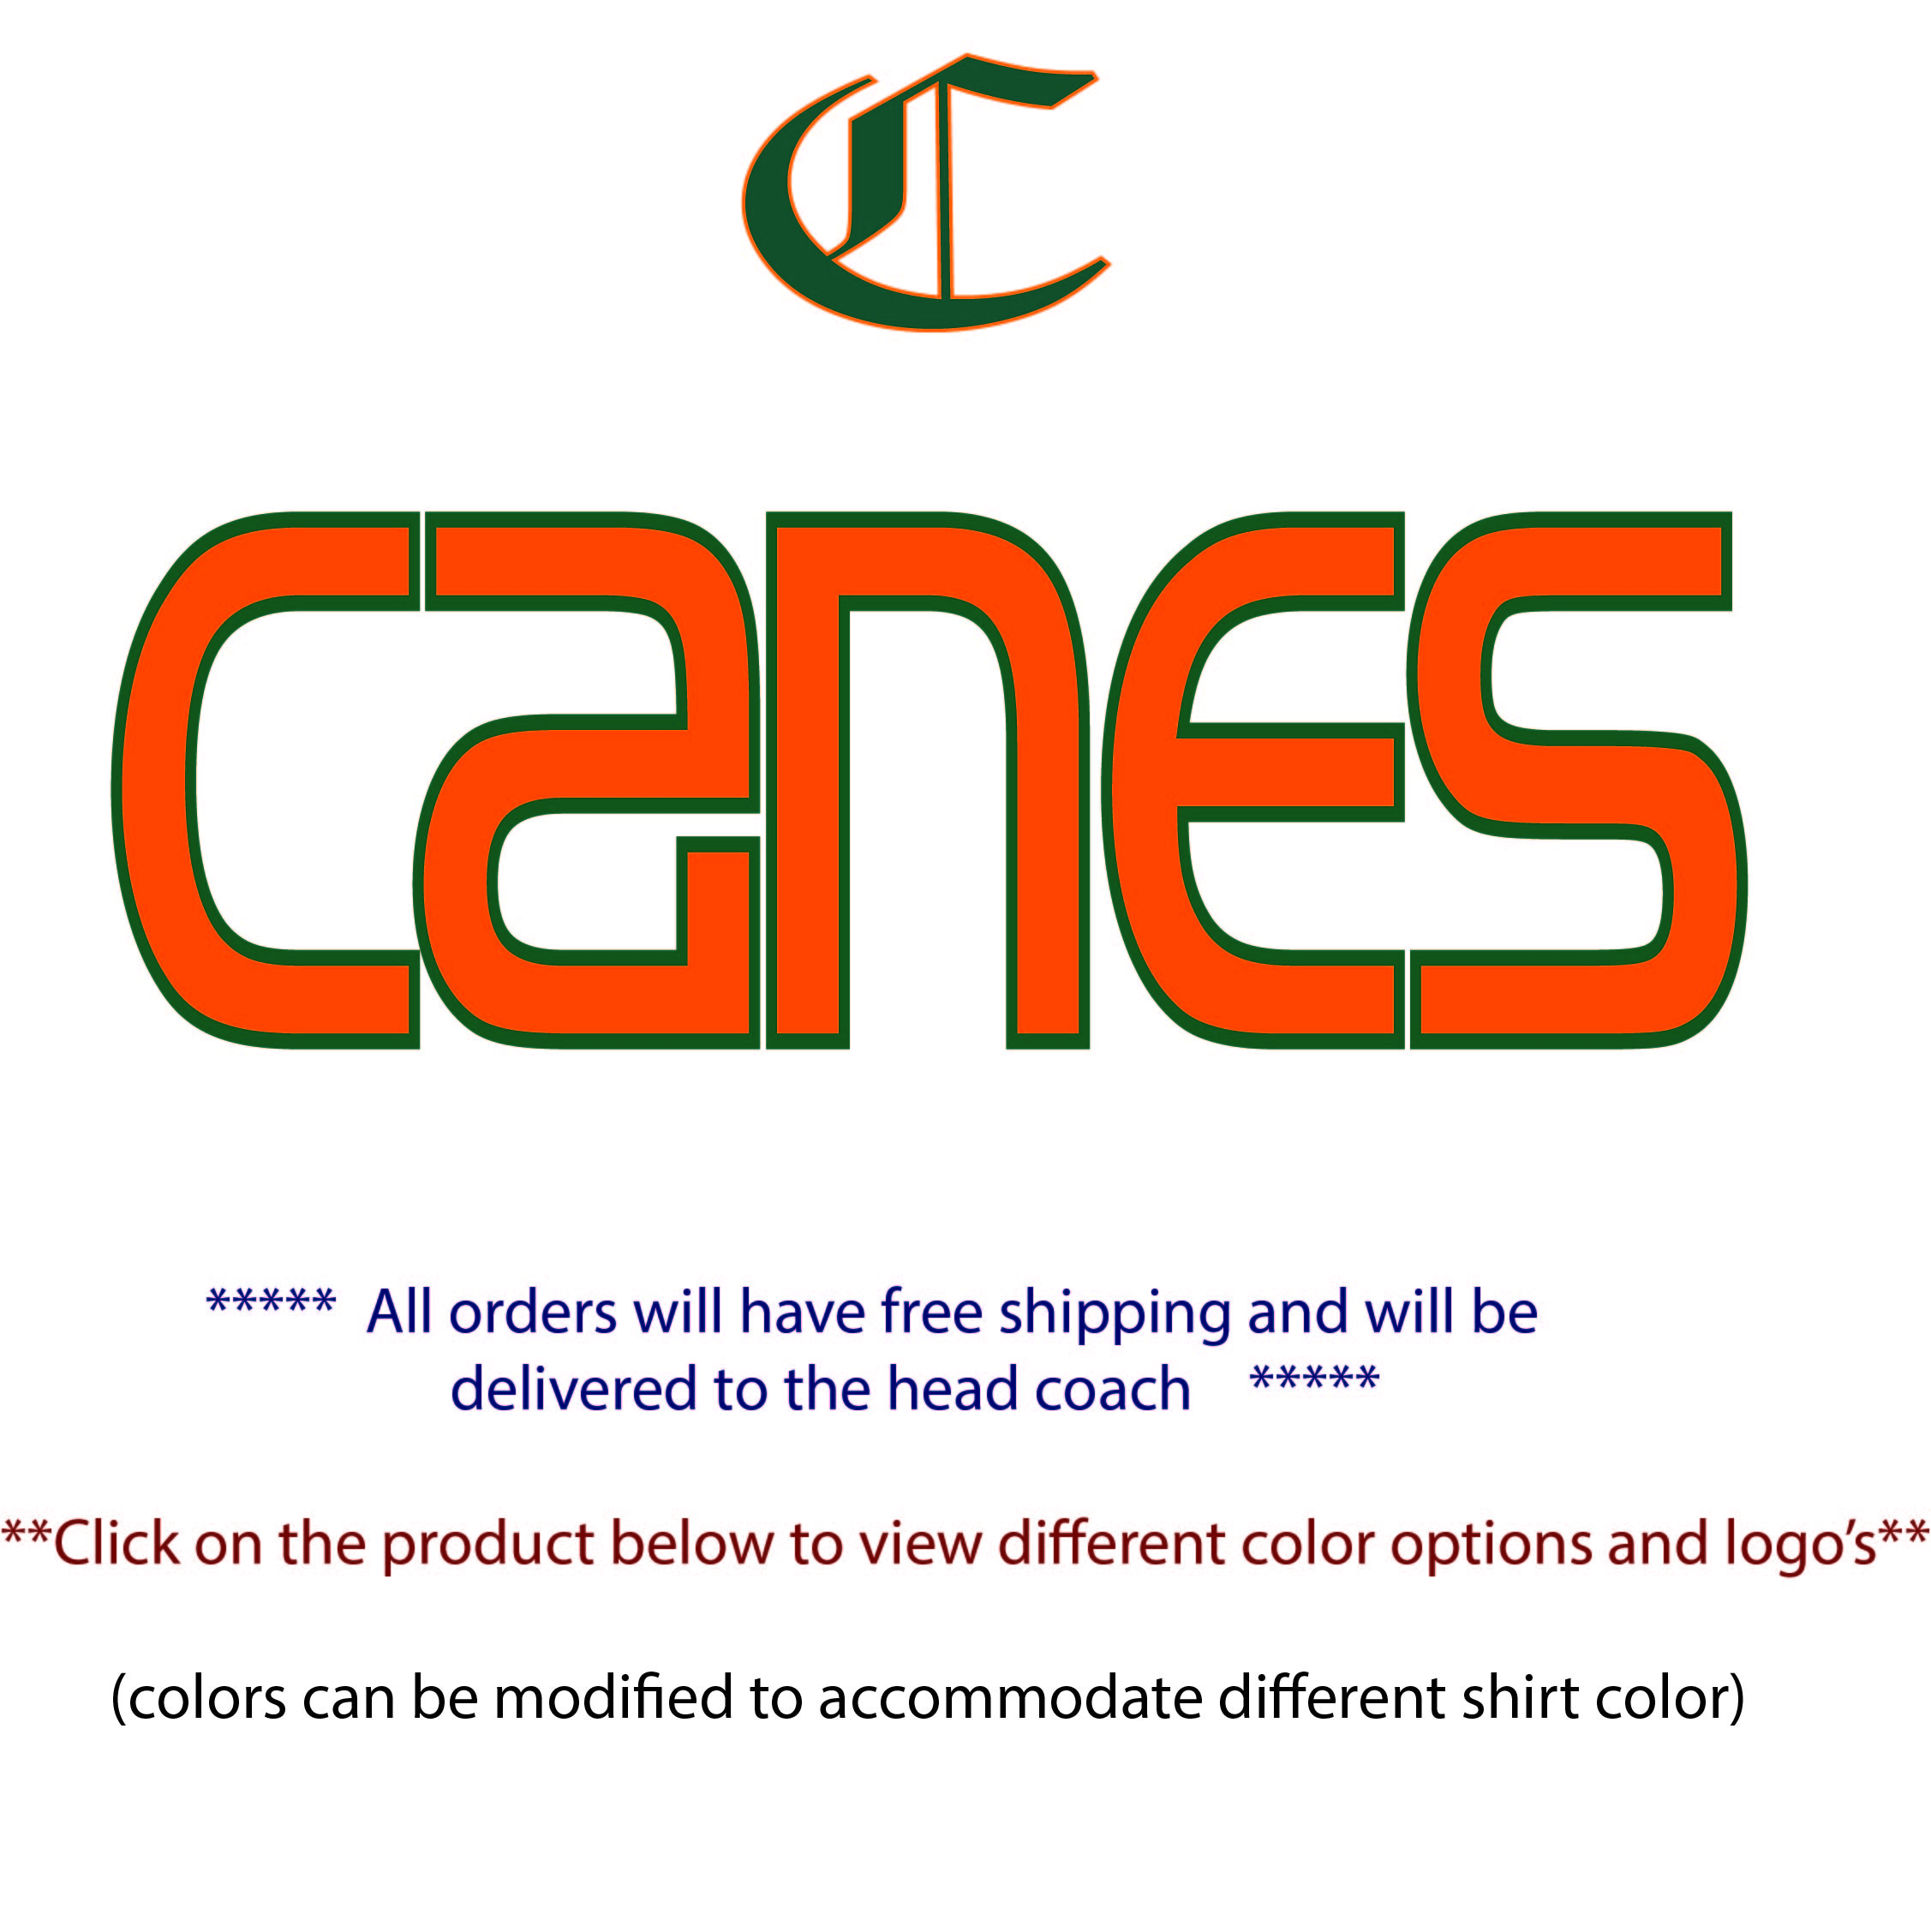 canes-web-site-header.jpg